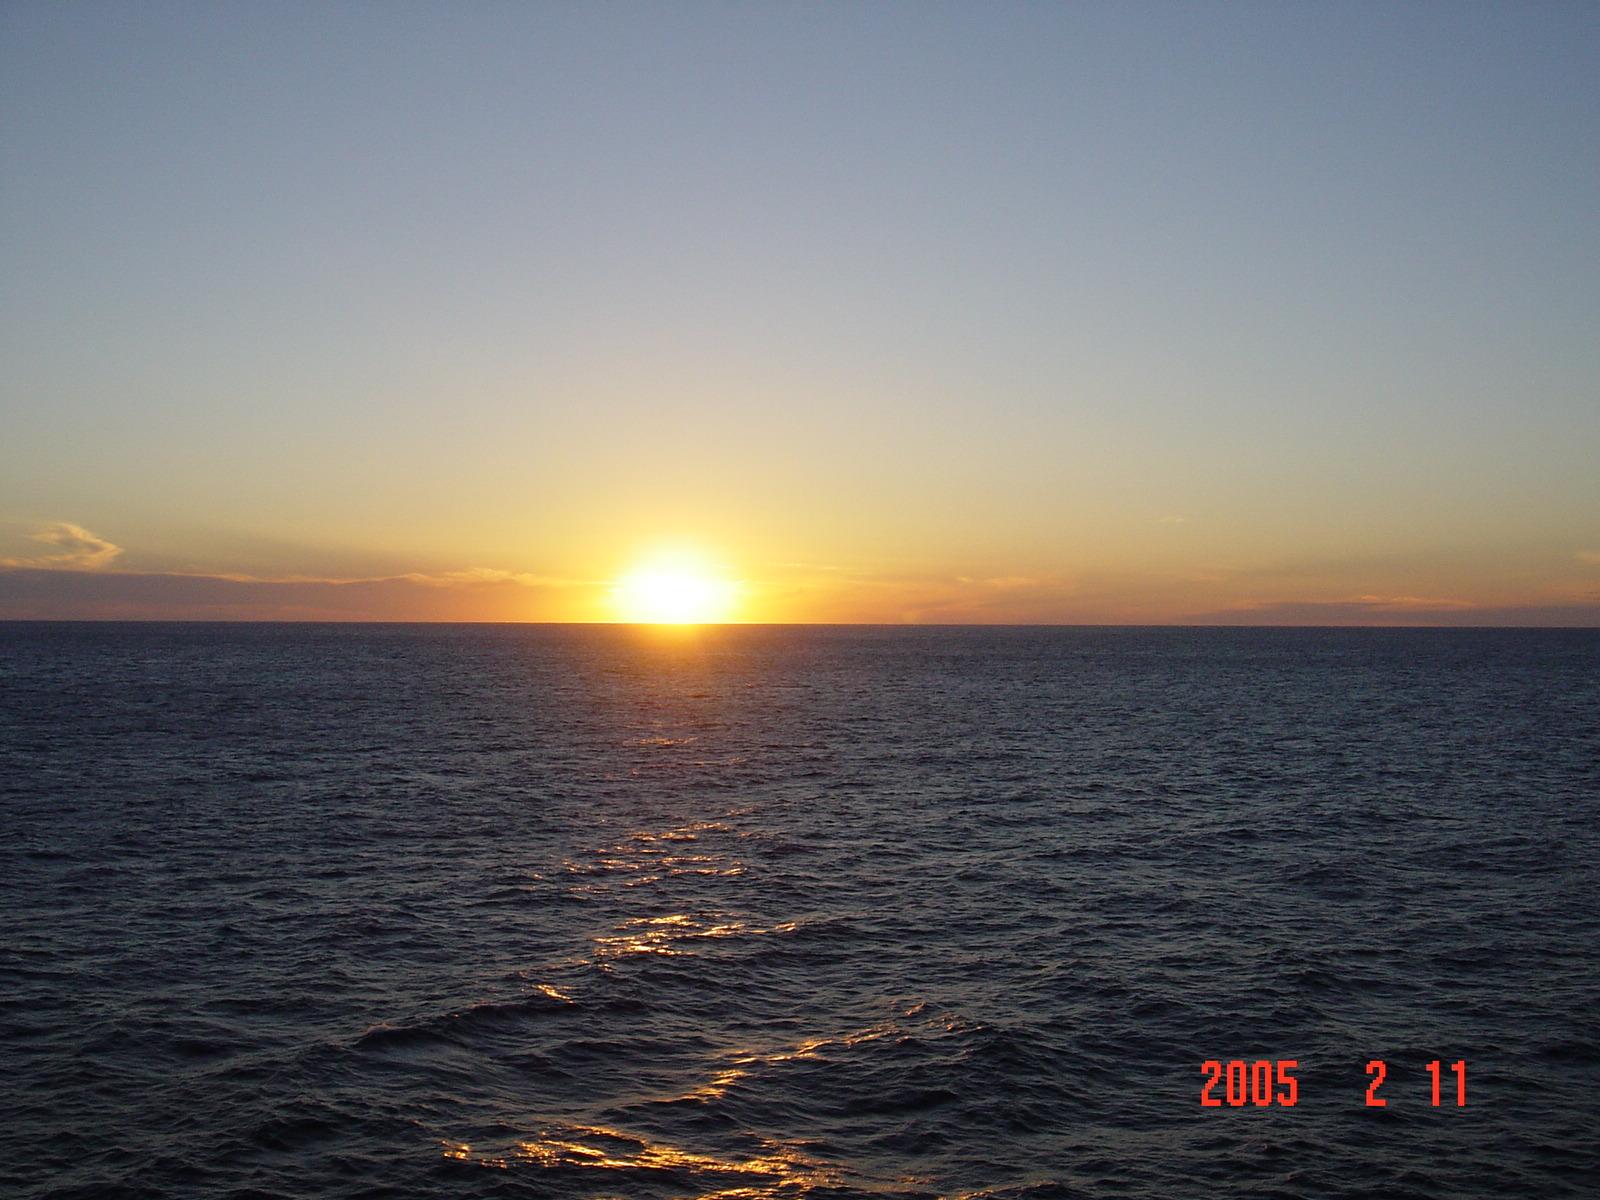 sunset123456789.jpg - Sunset